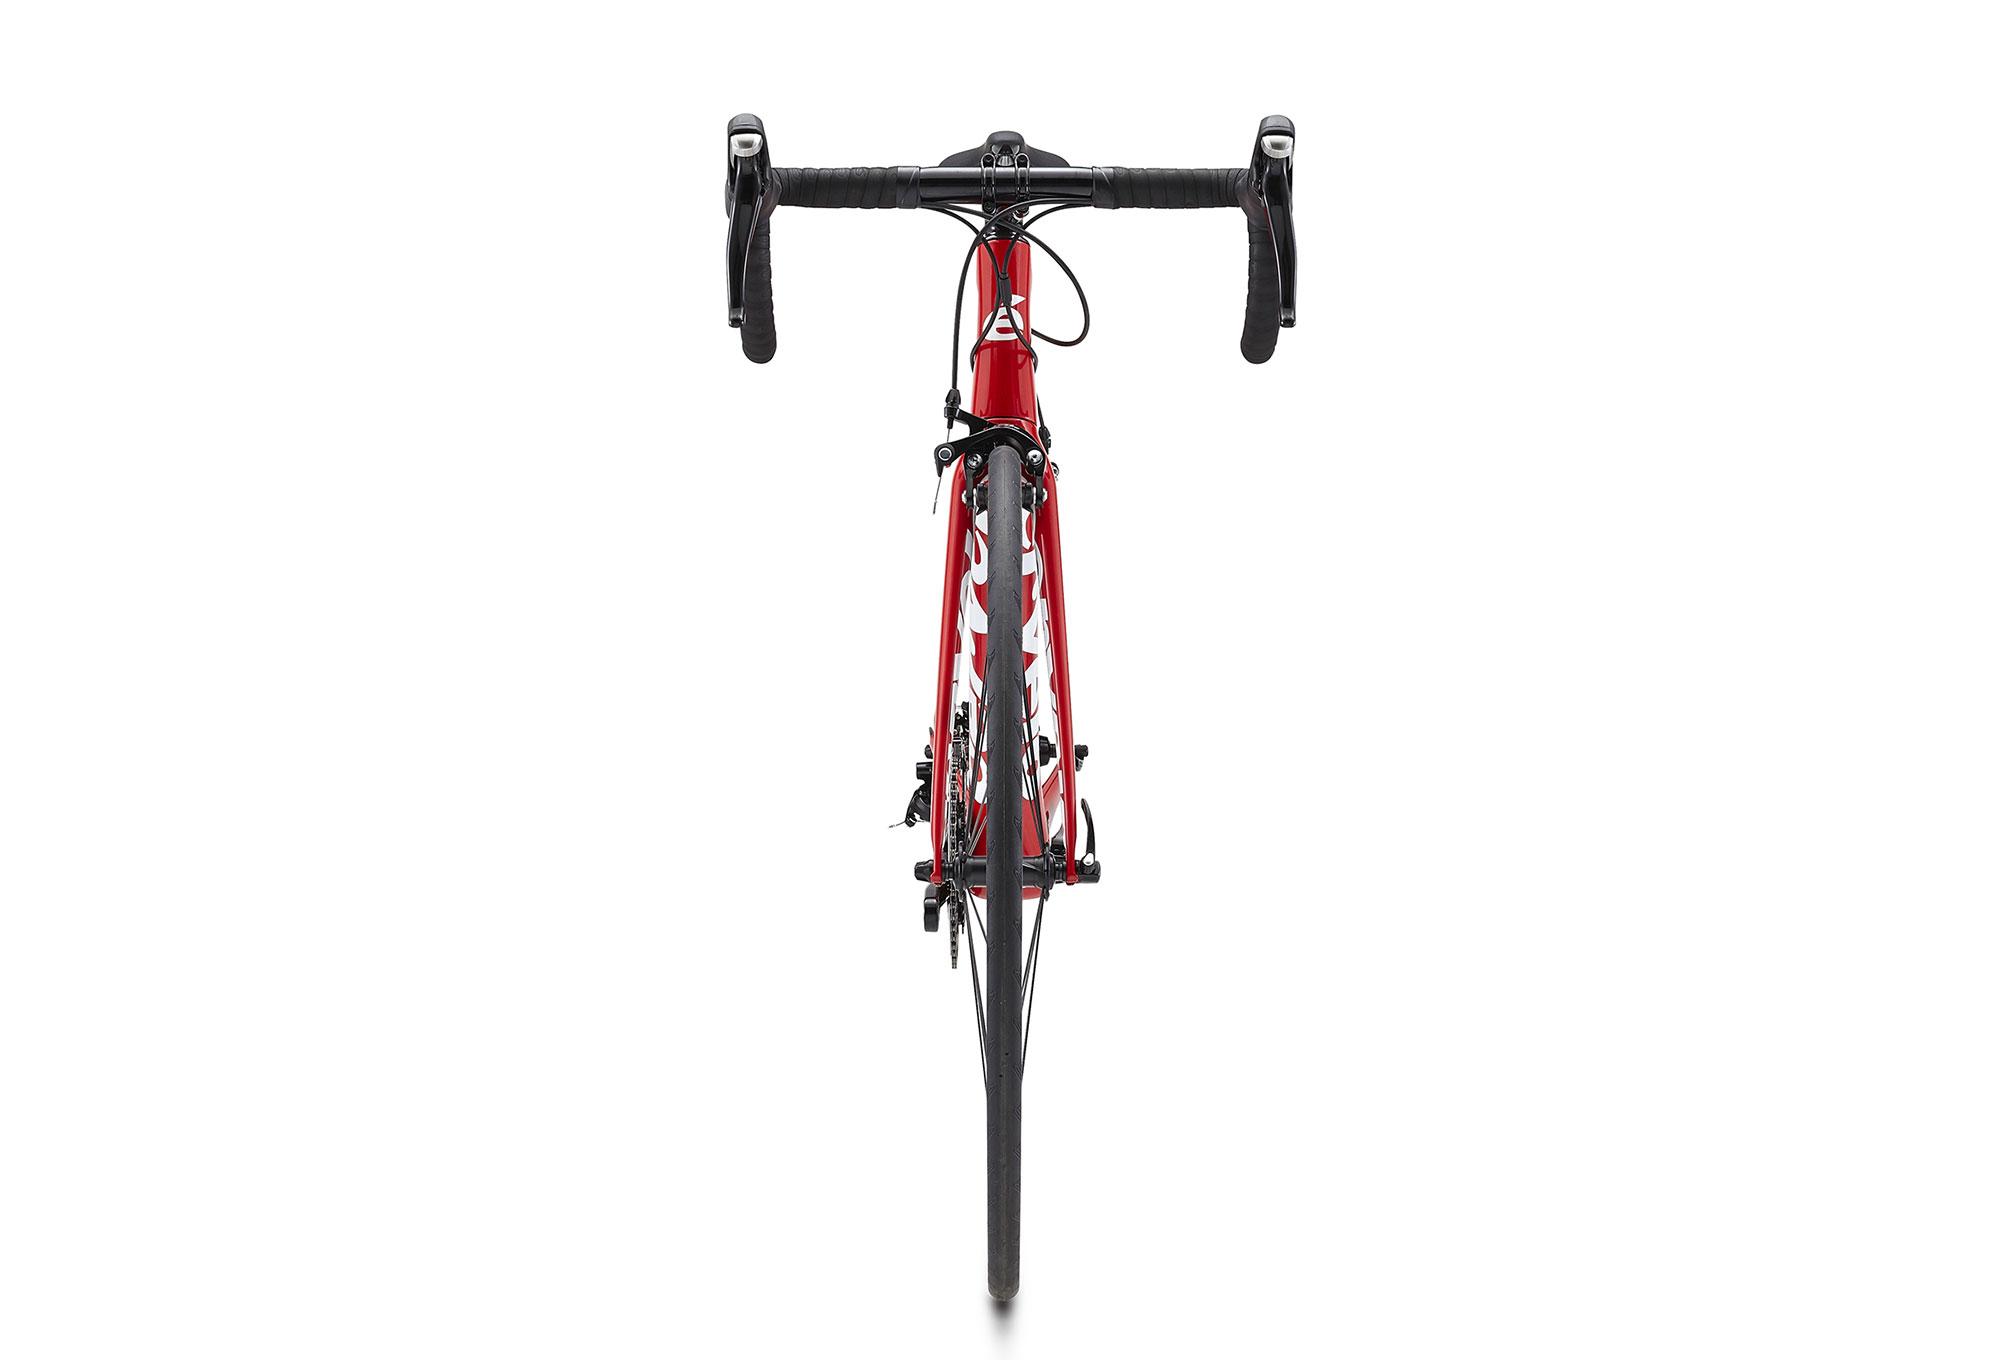 bicicleta cerv u00e9lo r2 shimano 105 5800 11v 2018 rojo